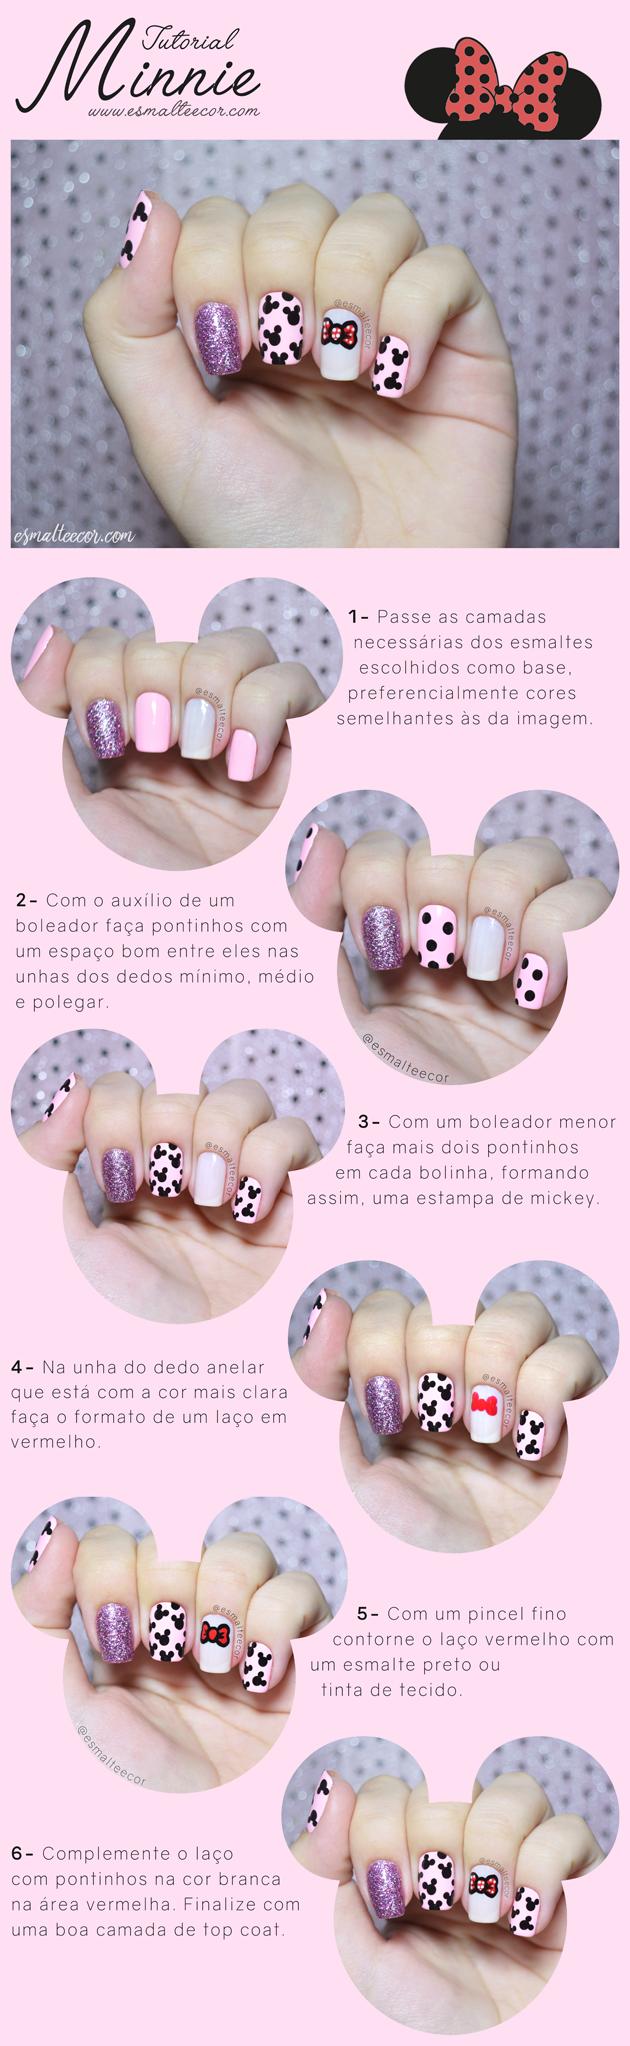 tutorial nail art unha decorada disney passo a passo Minnie